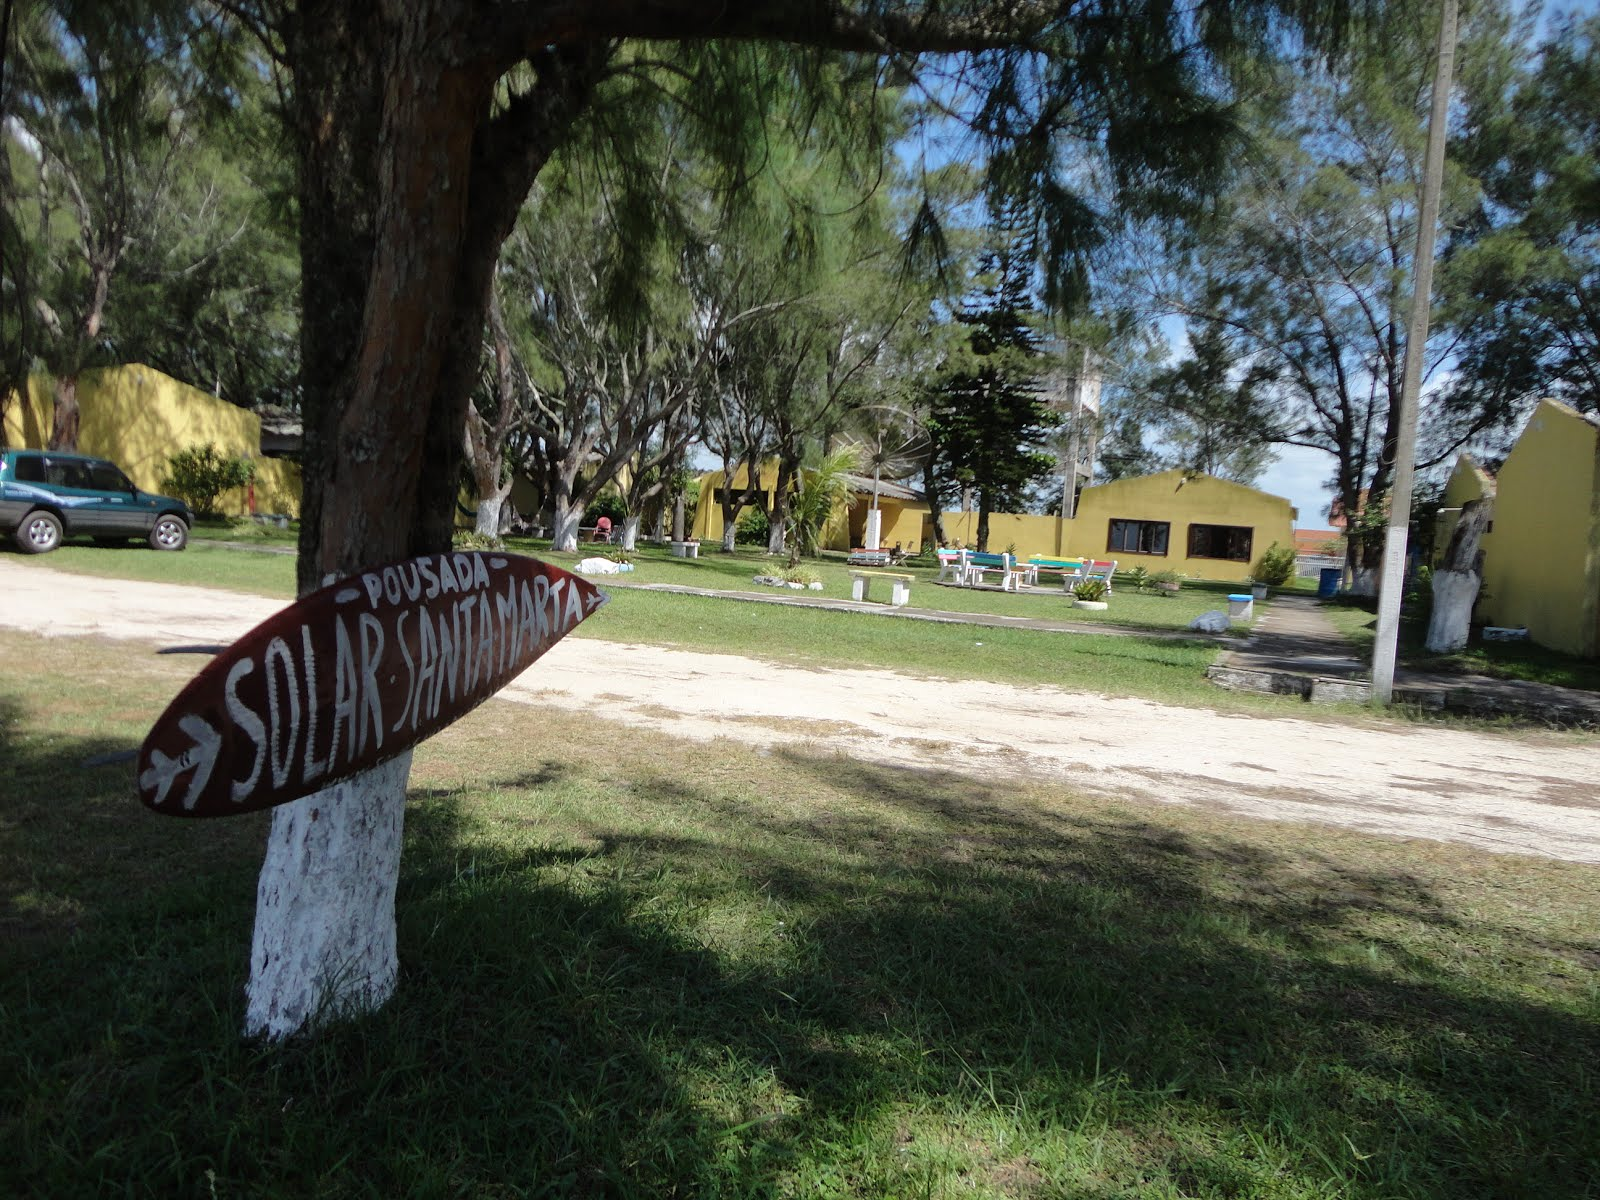 Visite Solar Santa Marta